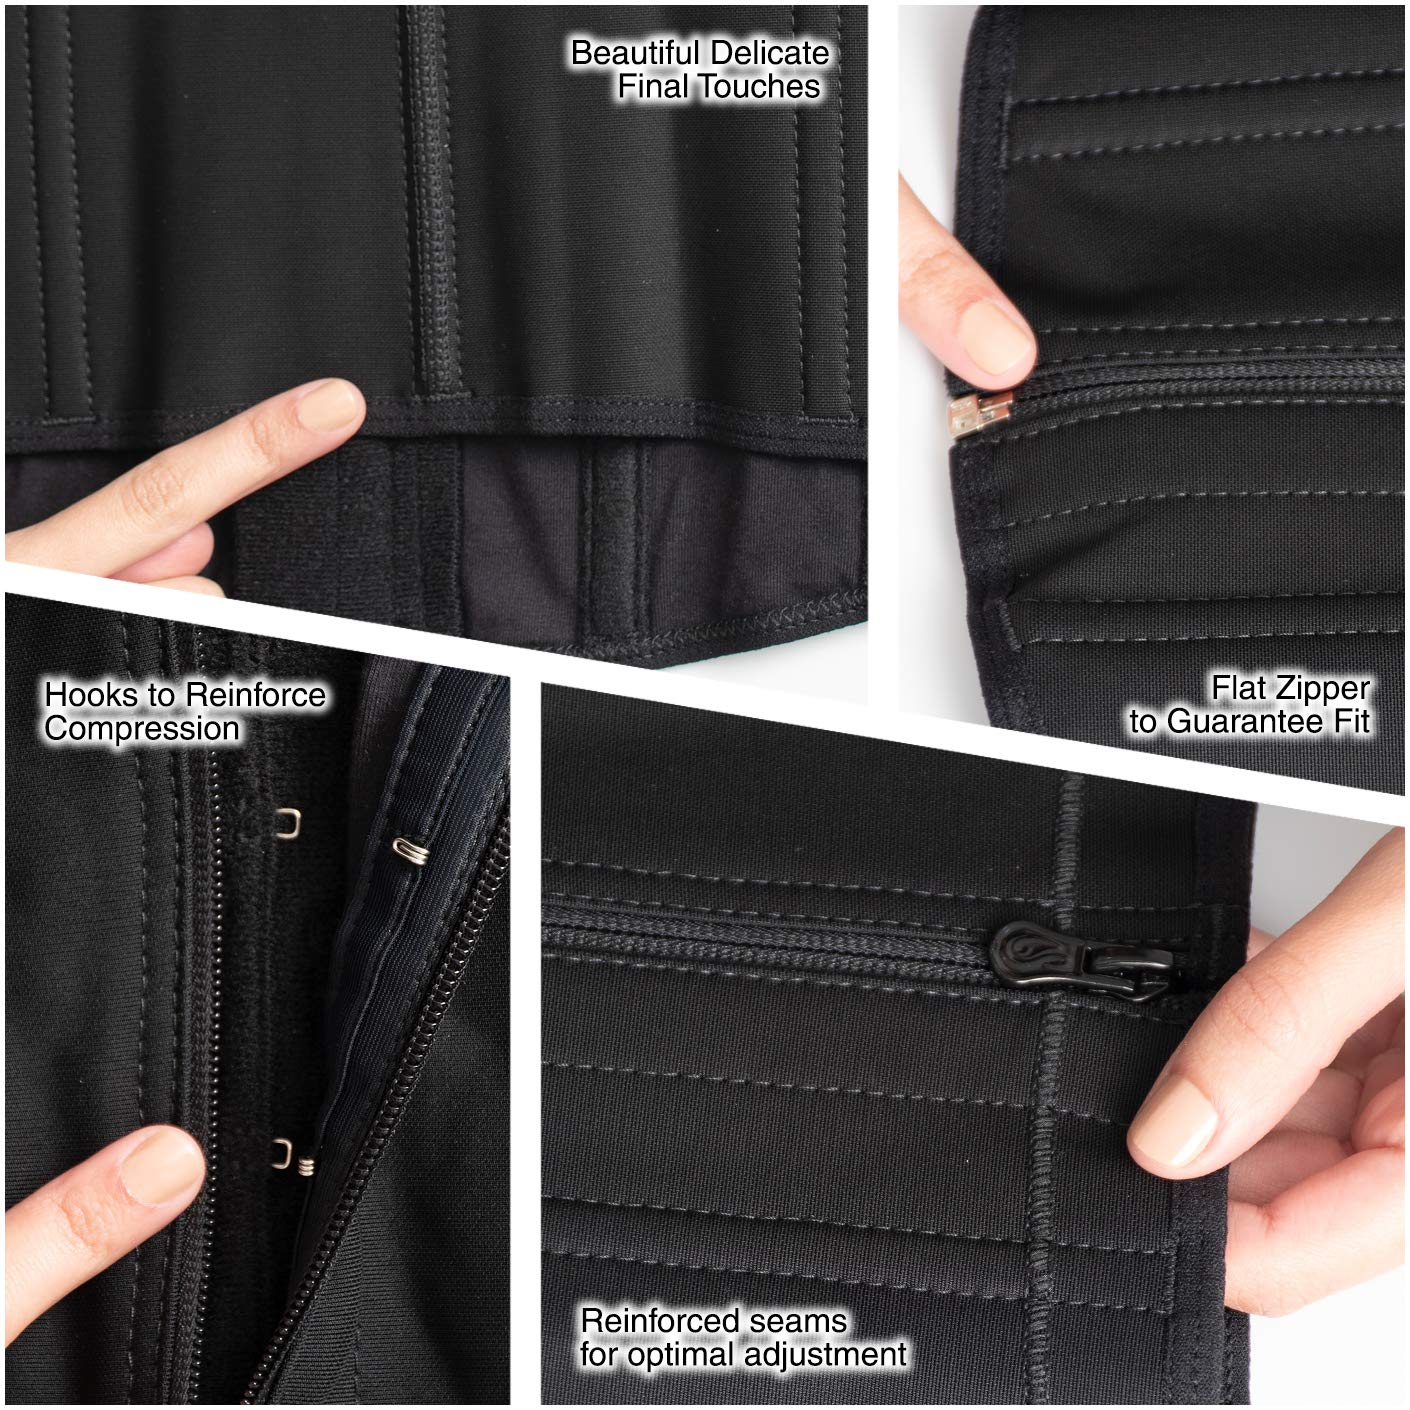 Salome 0315-1 Waist Shaper Flat Tummy Control Fajas Colombianas Cinturillas